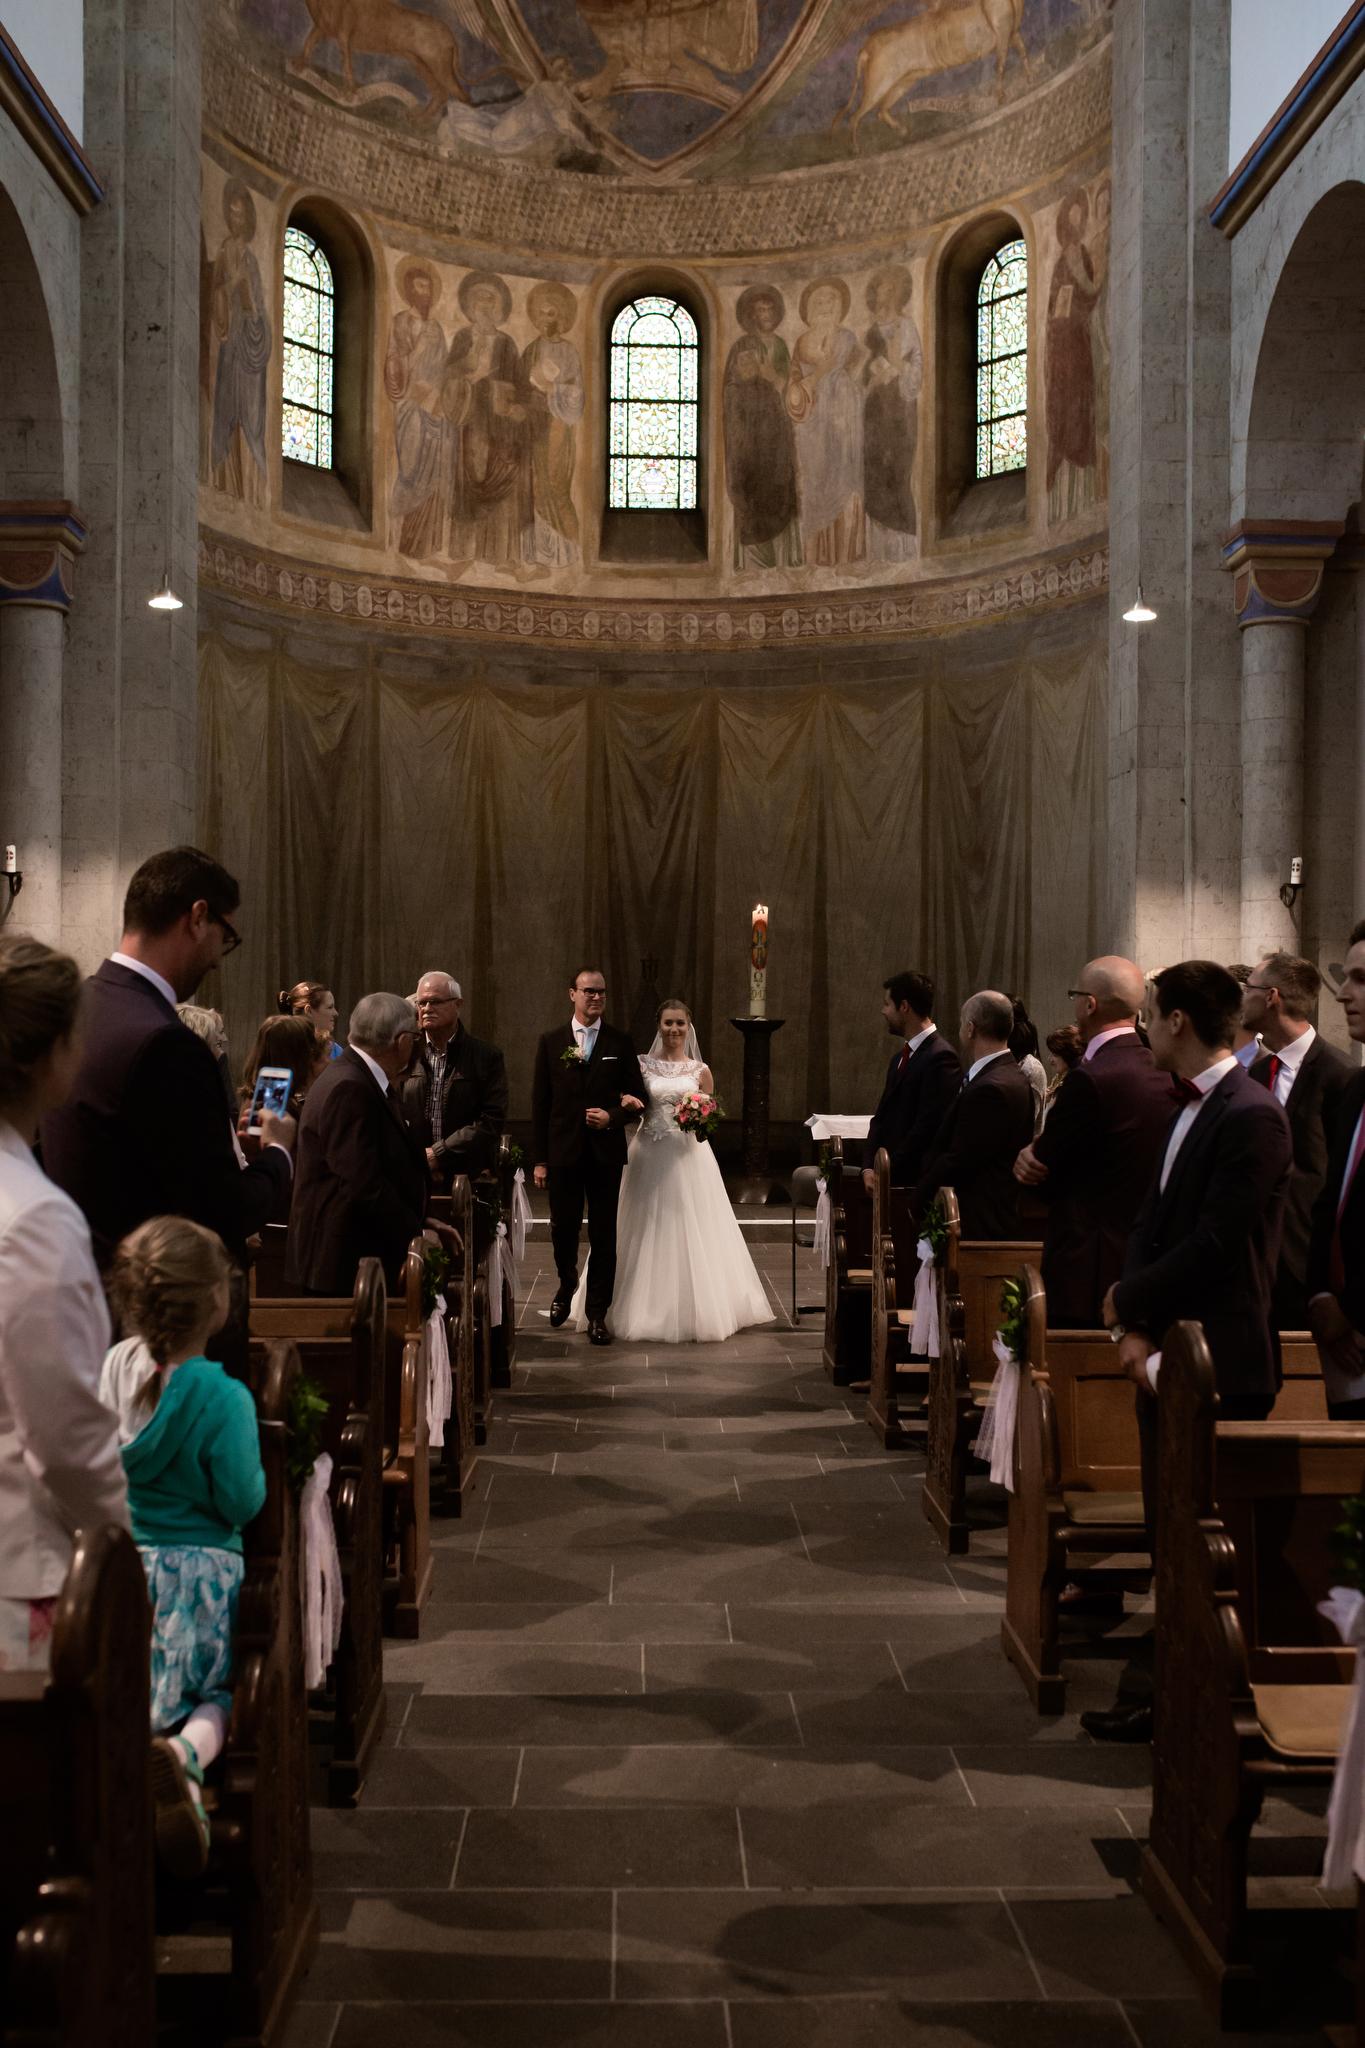 Claudia Krawinkel Fotografie Hochzeitsfotograf Essen Düsseldorf Dormagen Kloster Knechtsteden Hochzeitsreportage Hochzeit Knechtsteden44